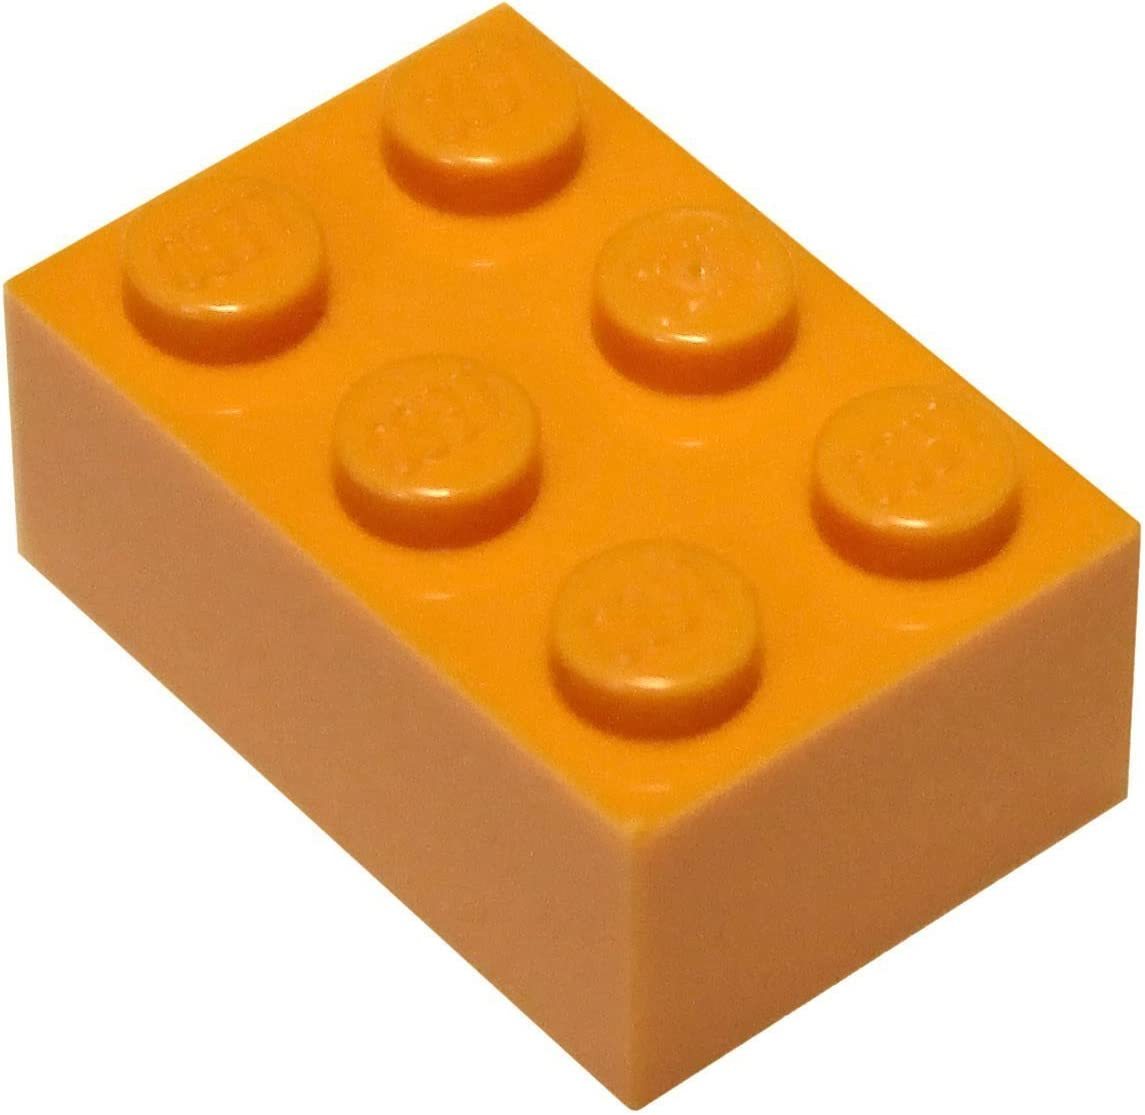 LEGO Parts and Pieces: 2x3 Orange (Bright Orange) Brick x100